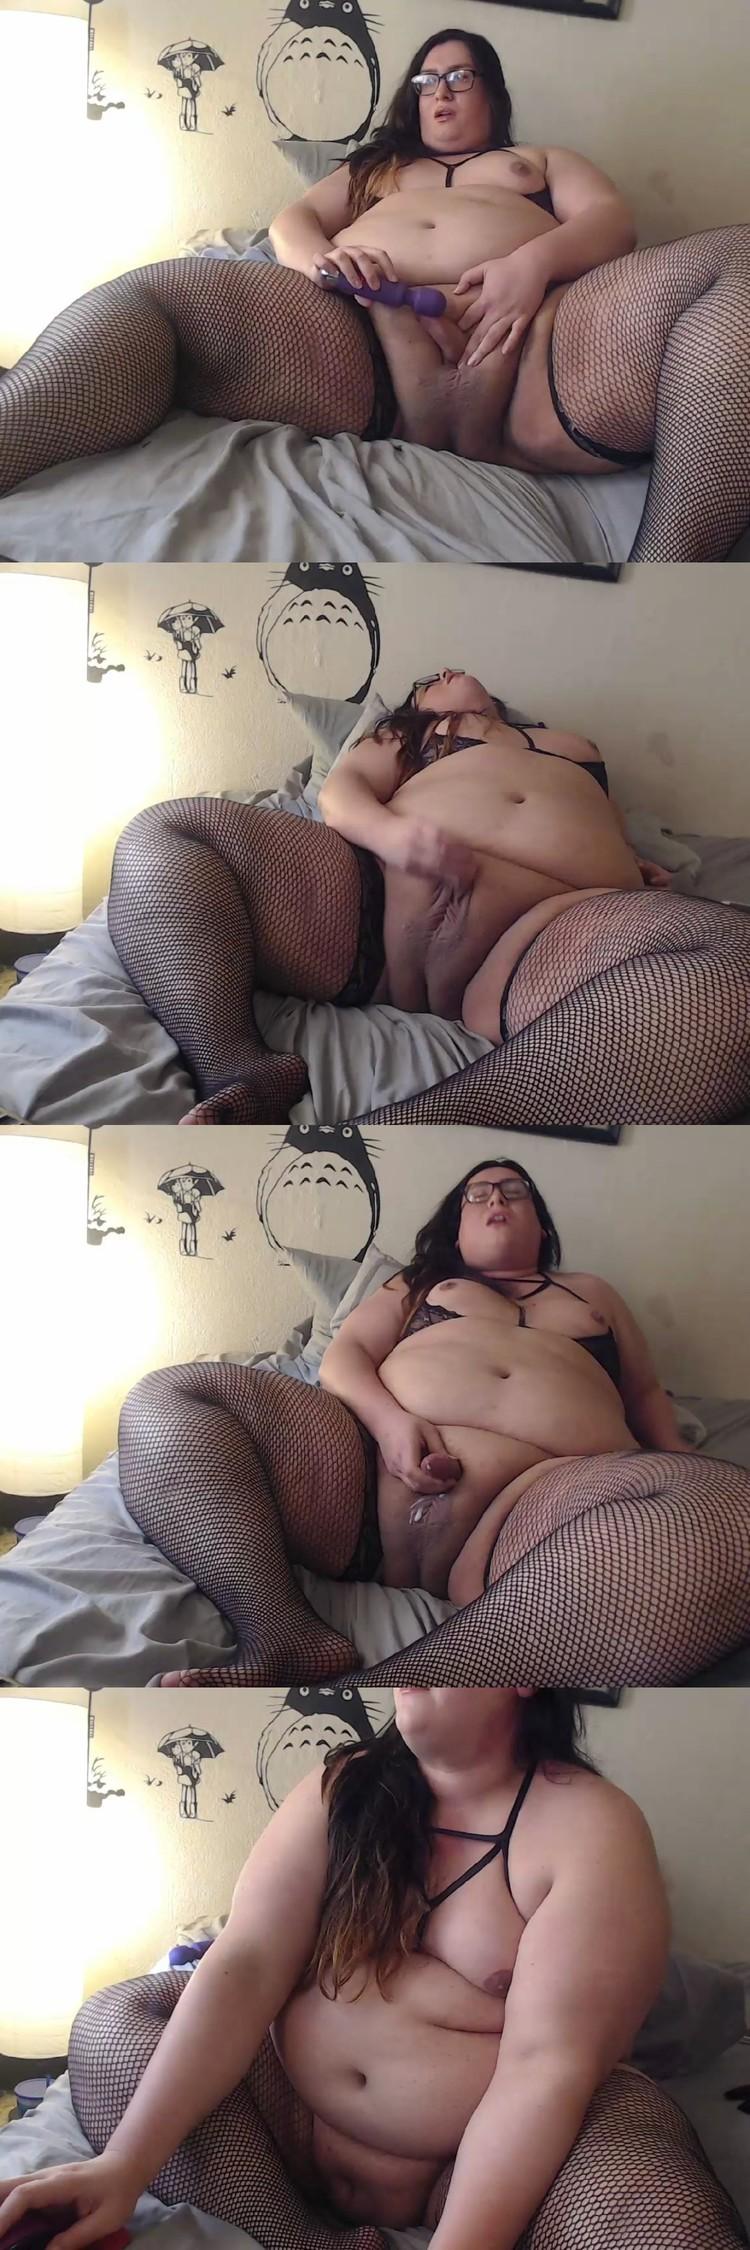 Bbw Tranny Sex shemale beauties sucking & fucking tranny porn videos p2